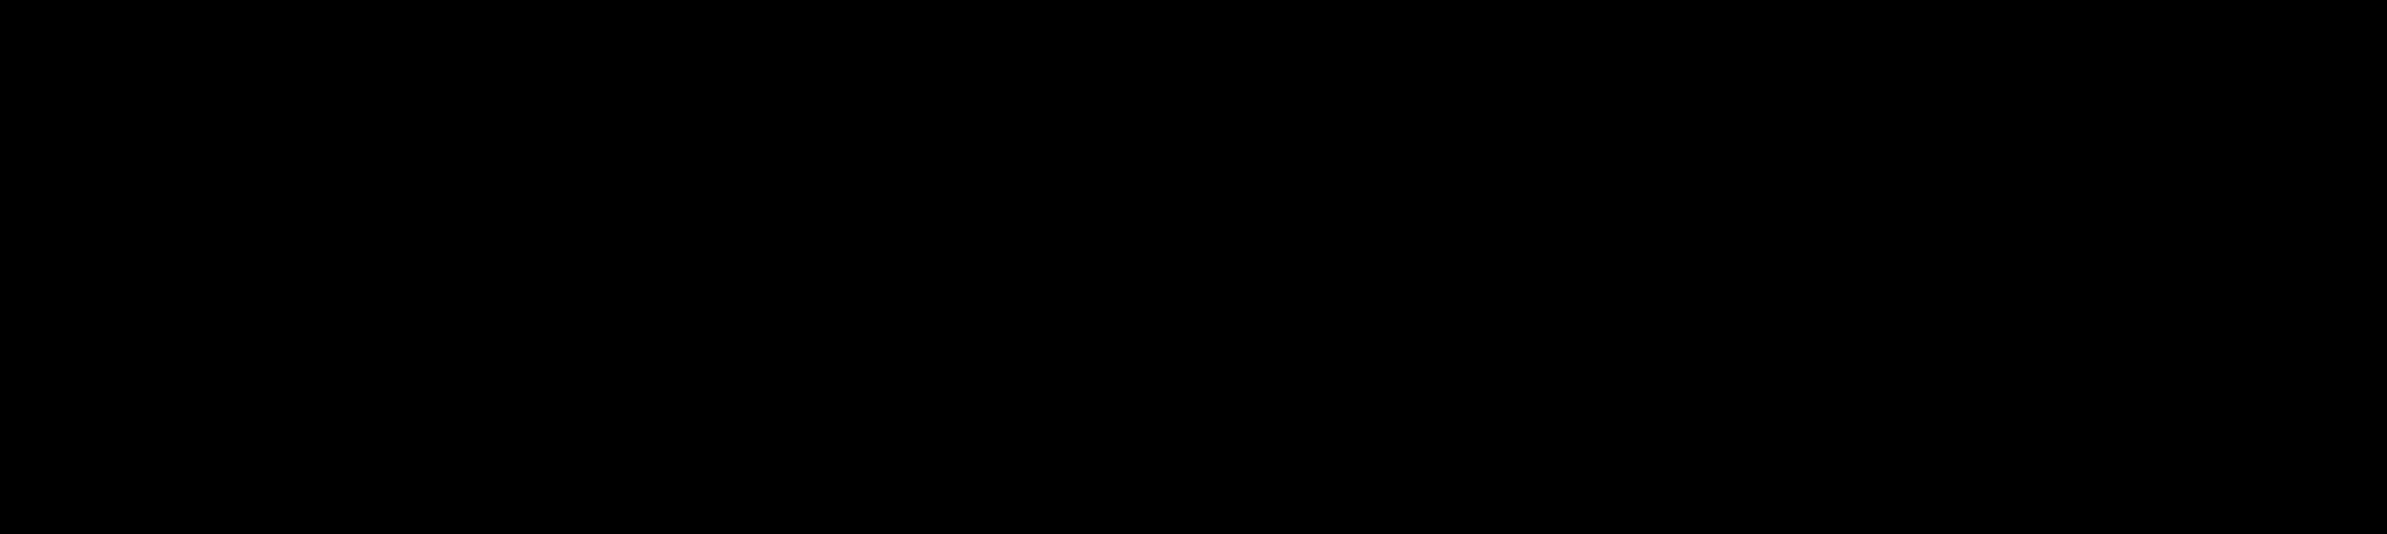 Klarna Bank AB (publ)